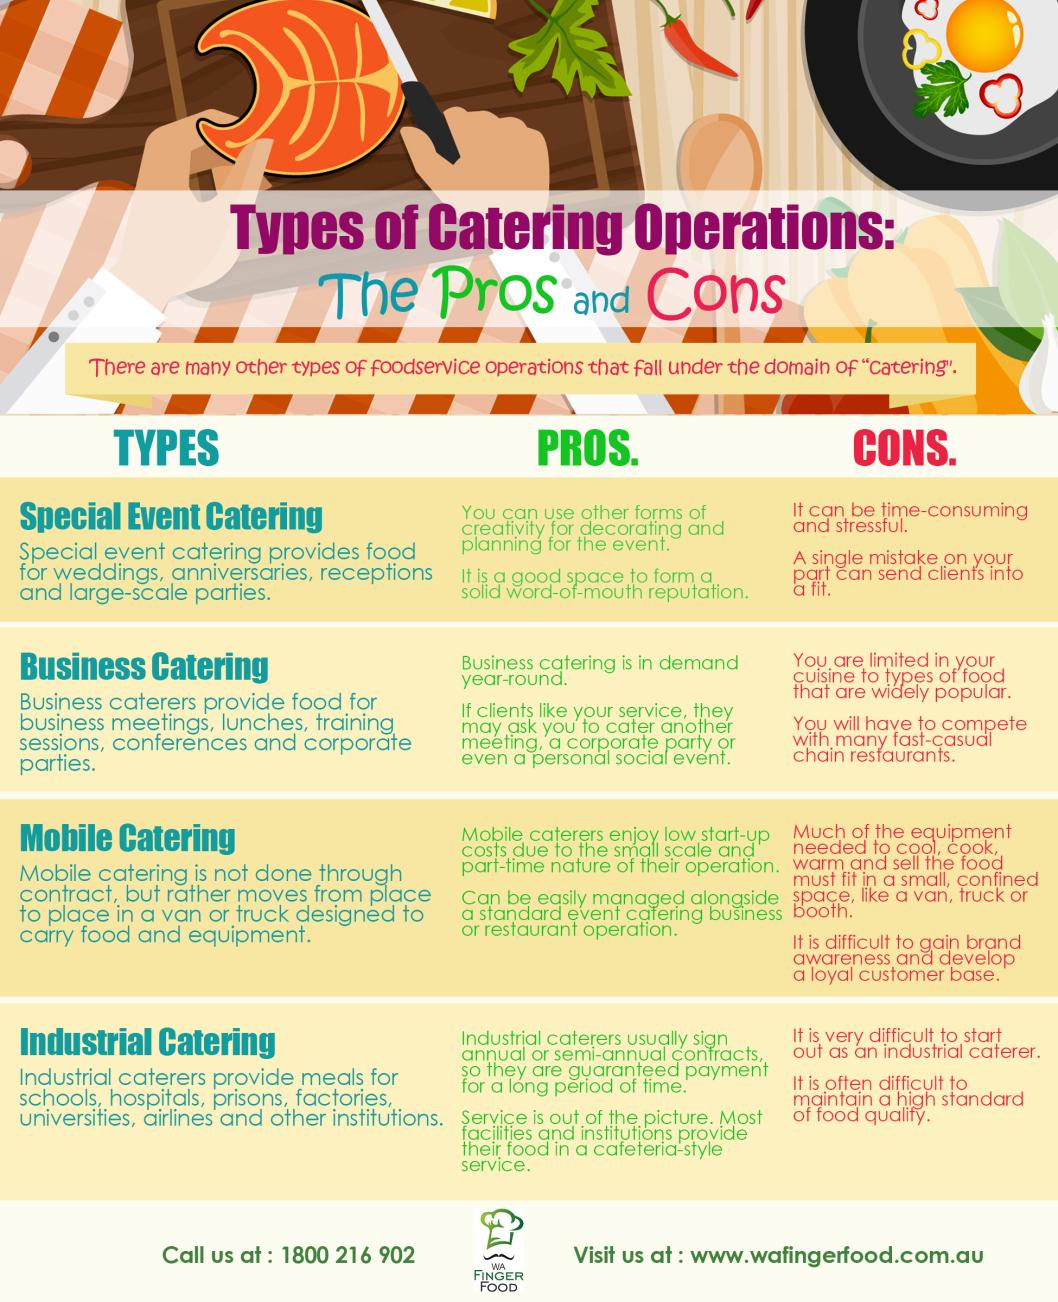 Welche Formen des Catering gibt es?